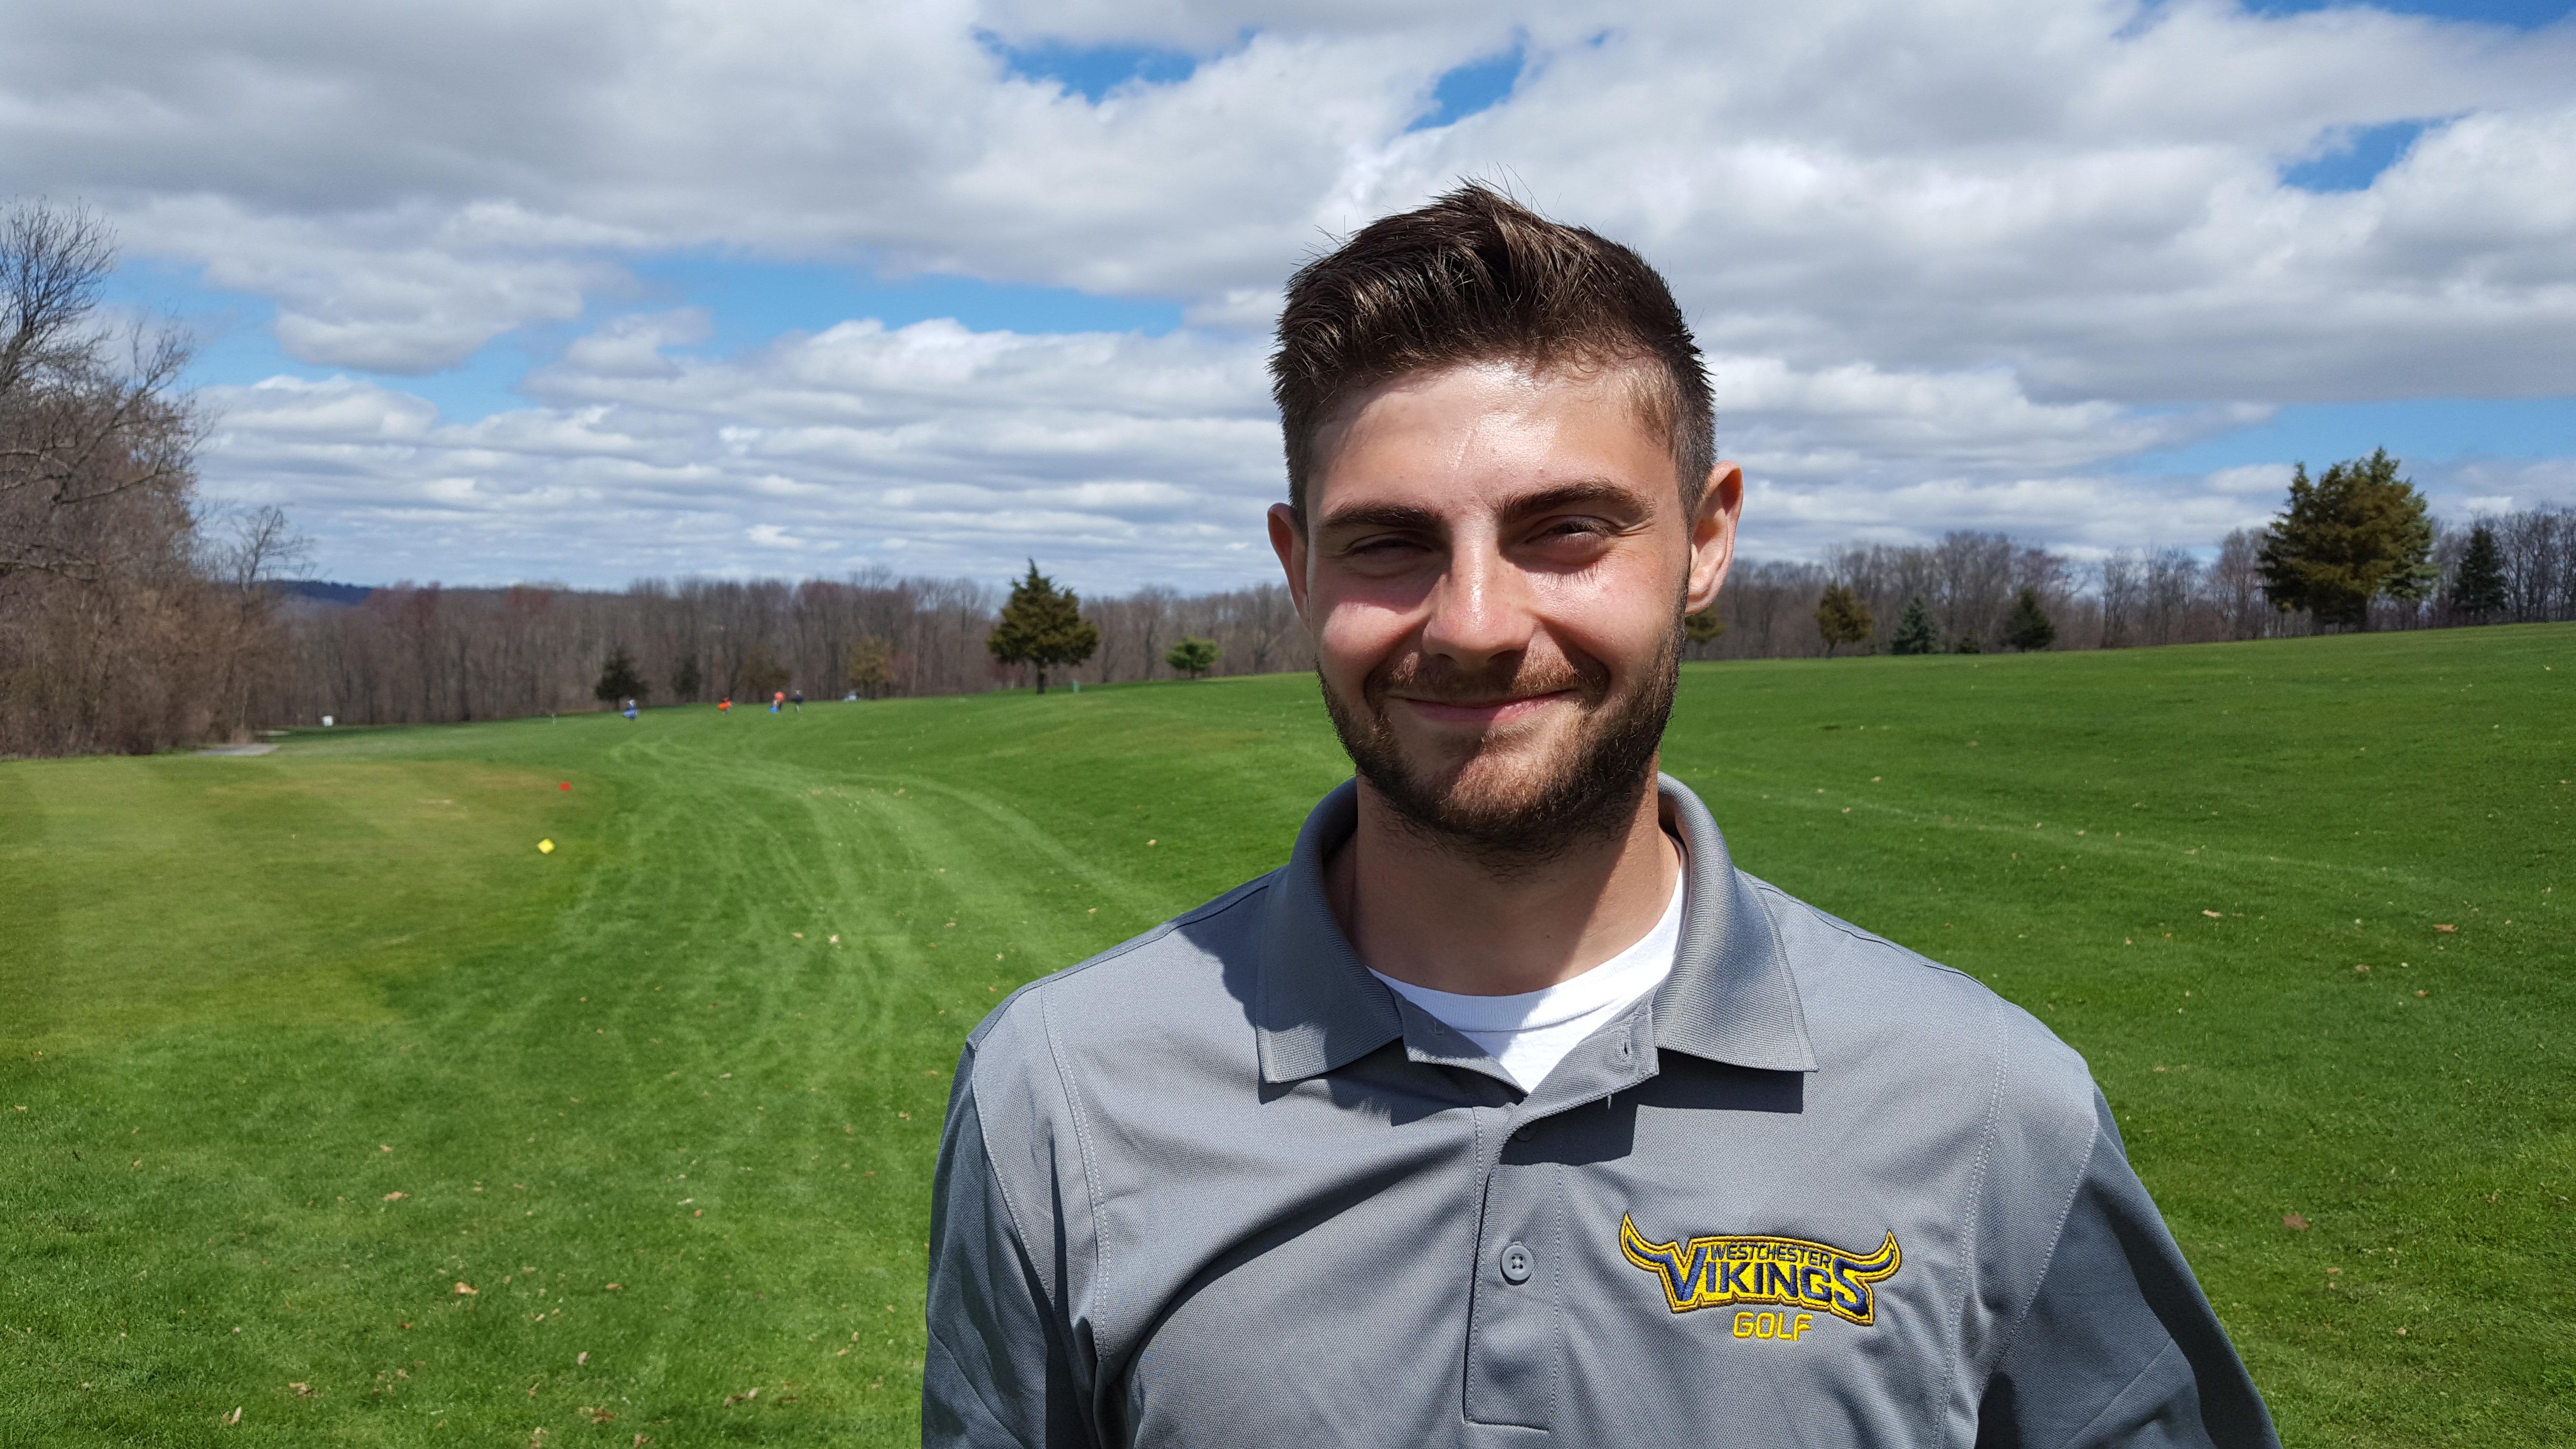 Joseph Danko, Westchester Golf